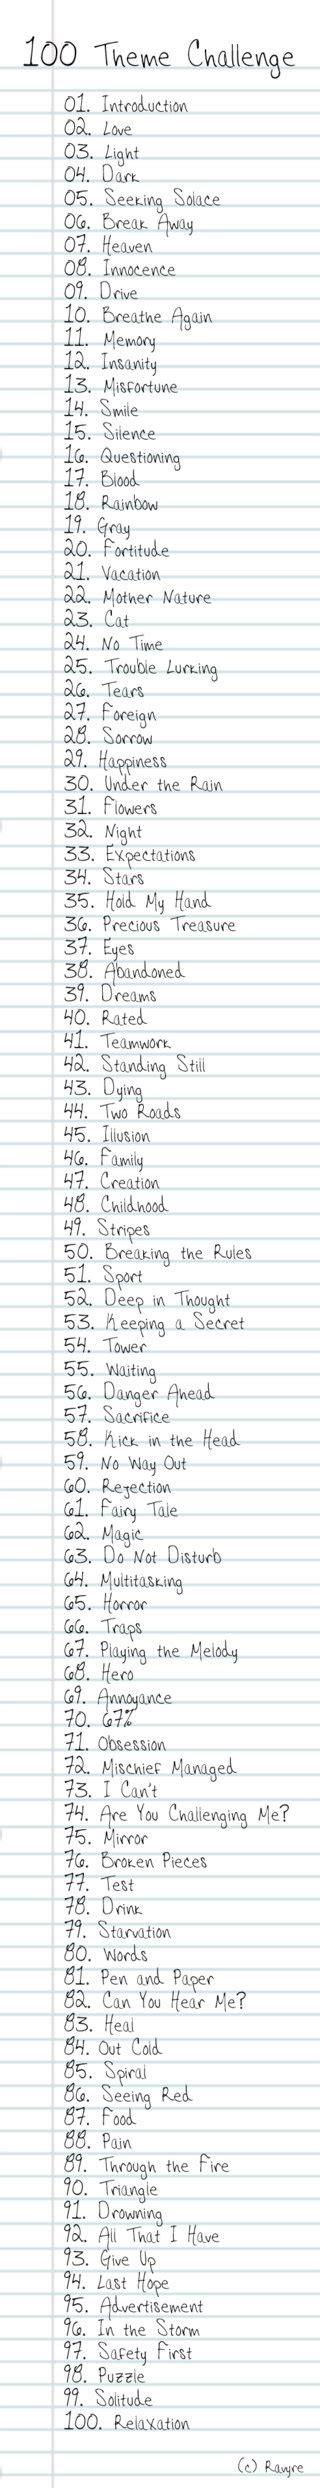 100 themes drawing challenge list 100 theme challenge list by ravyre on deviantart